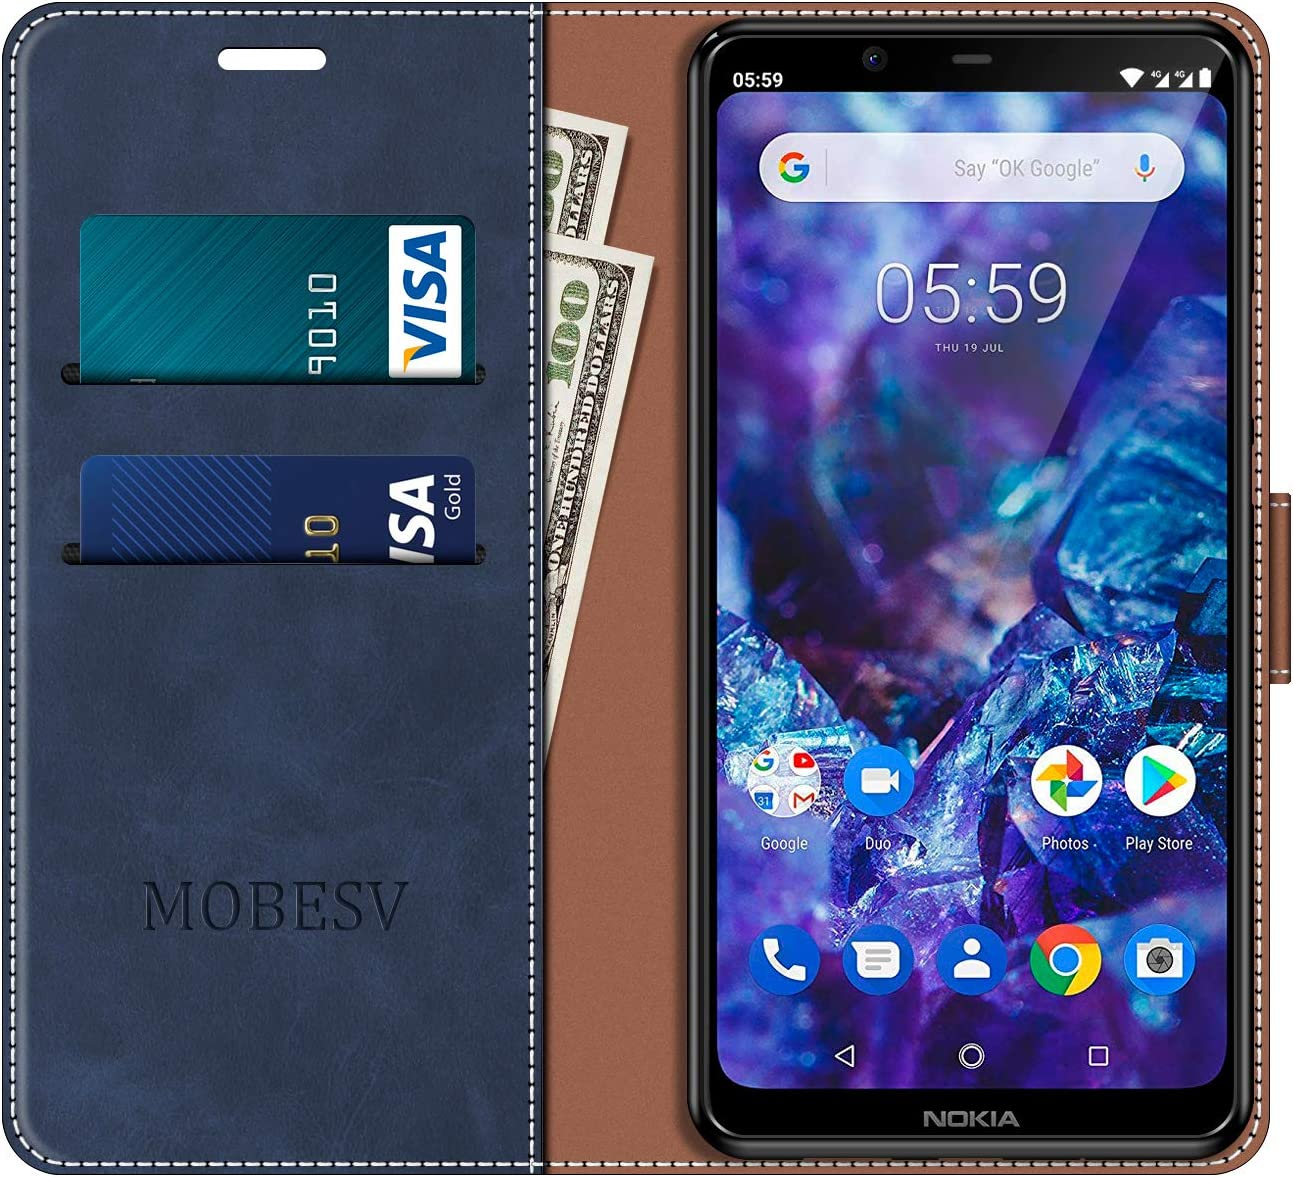 MOBESV Funda para Nokia 5.1 Plus, Funda Libro Nokia 5.1 Plus ...